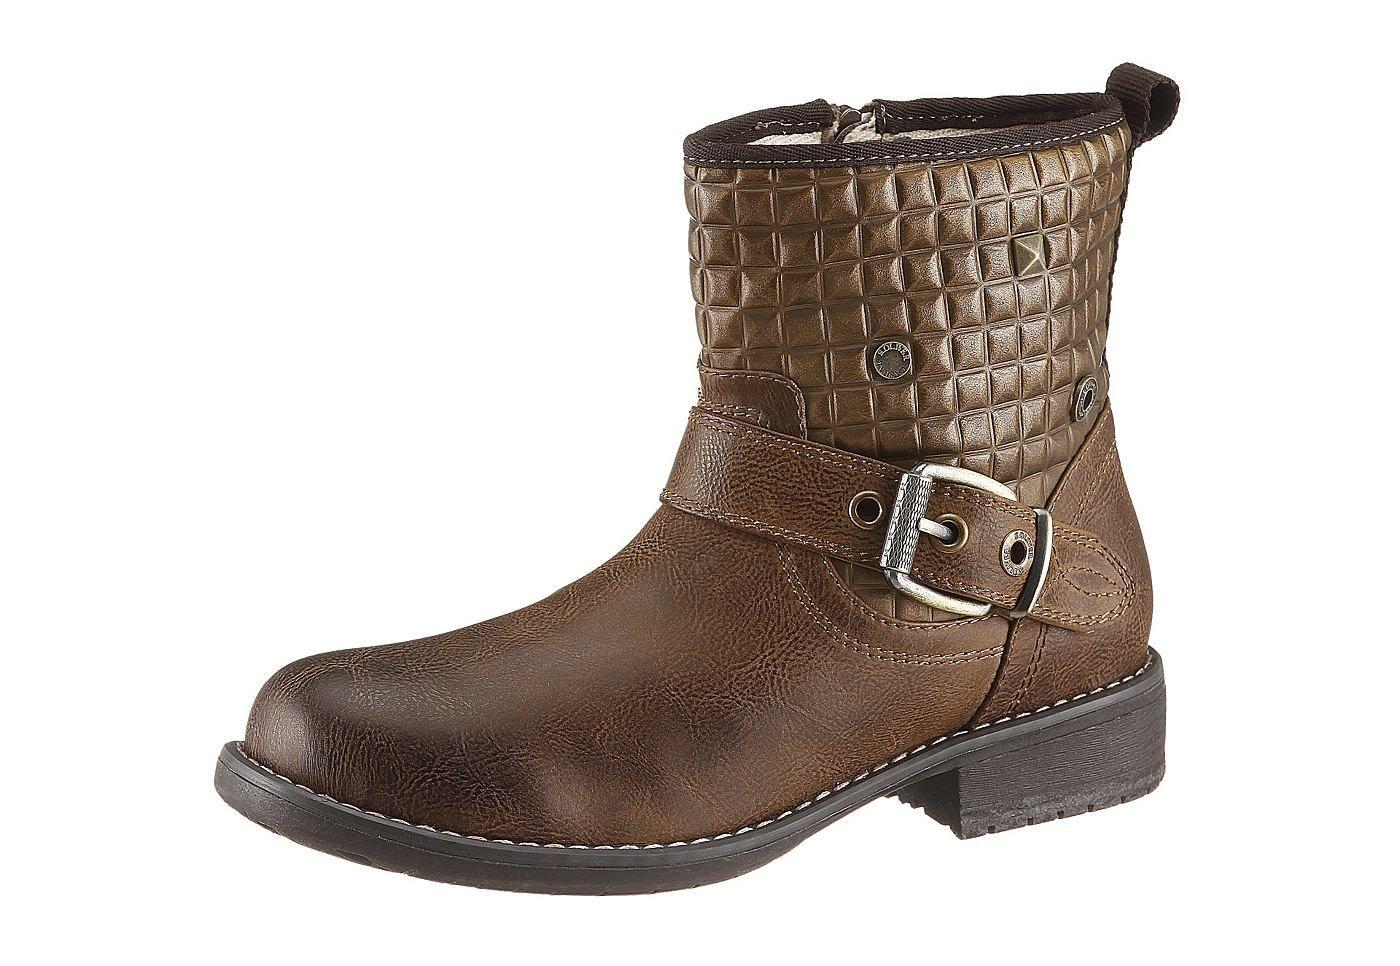 Boots, s. Oliver, Synthetik, Futter: Warmfutter, Decksohle aus Warmfutter, Synthetik-Laufsohle, 30 mm Absatz, Schuhweite: F (normal), Reißverschluss....